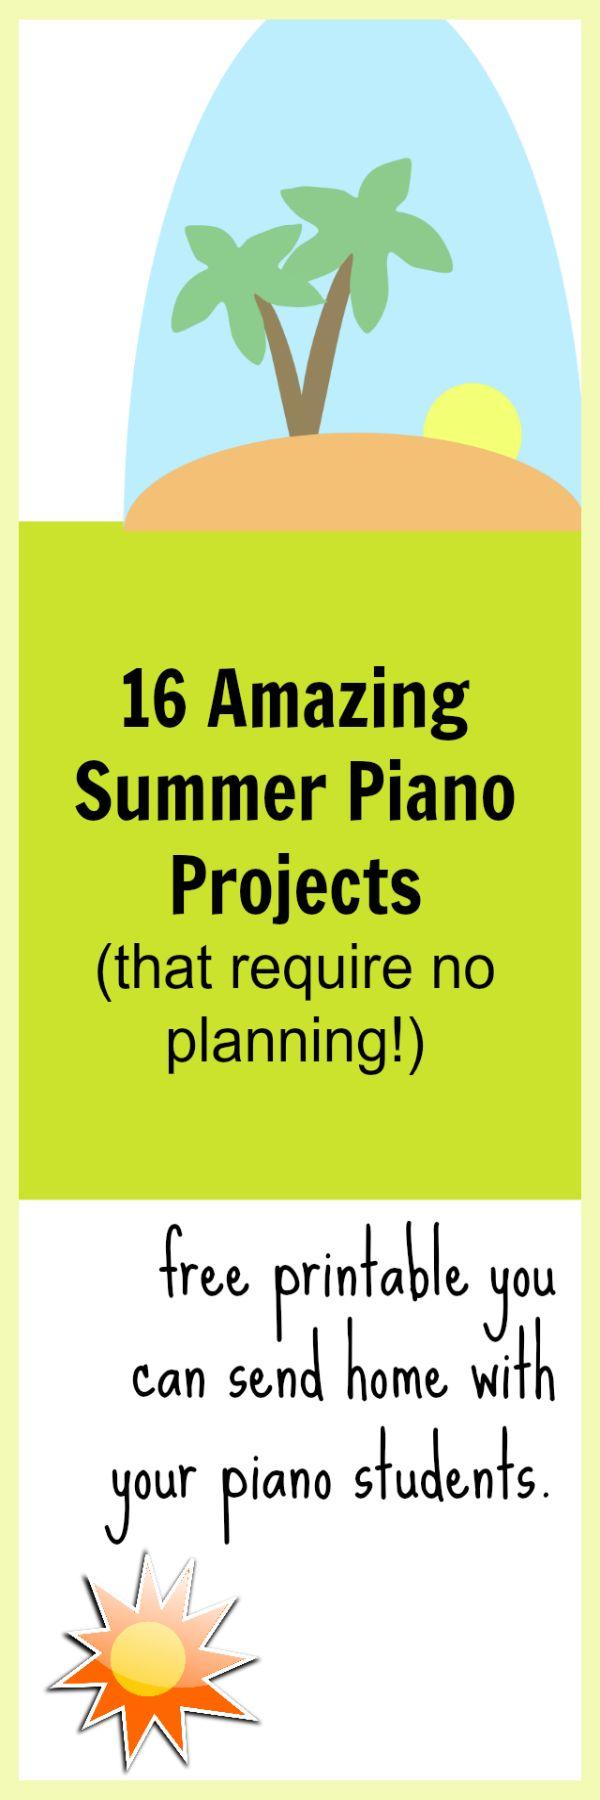 worksheet All Summer In A Day Worksheet Luizah Worksheet And – All Summer in a Day Worksheet